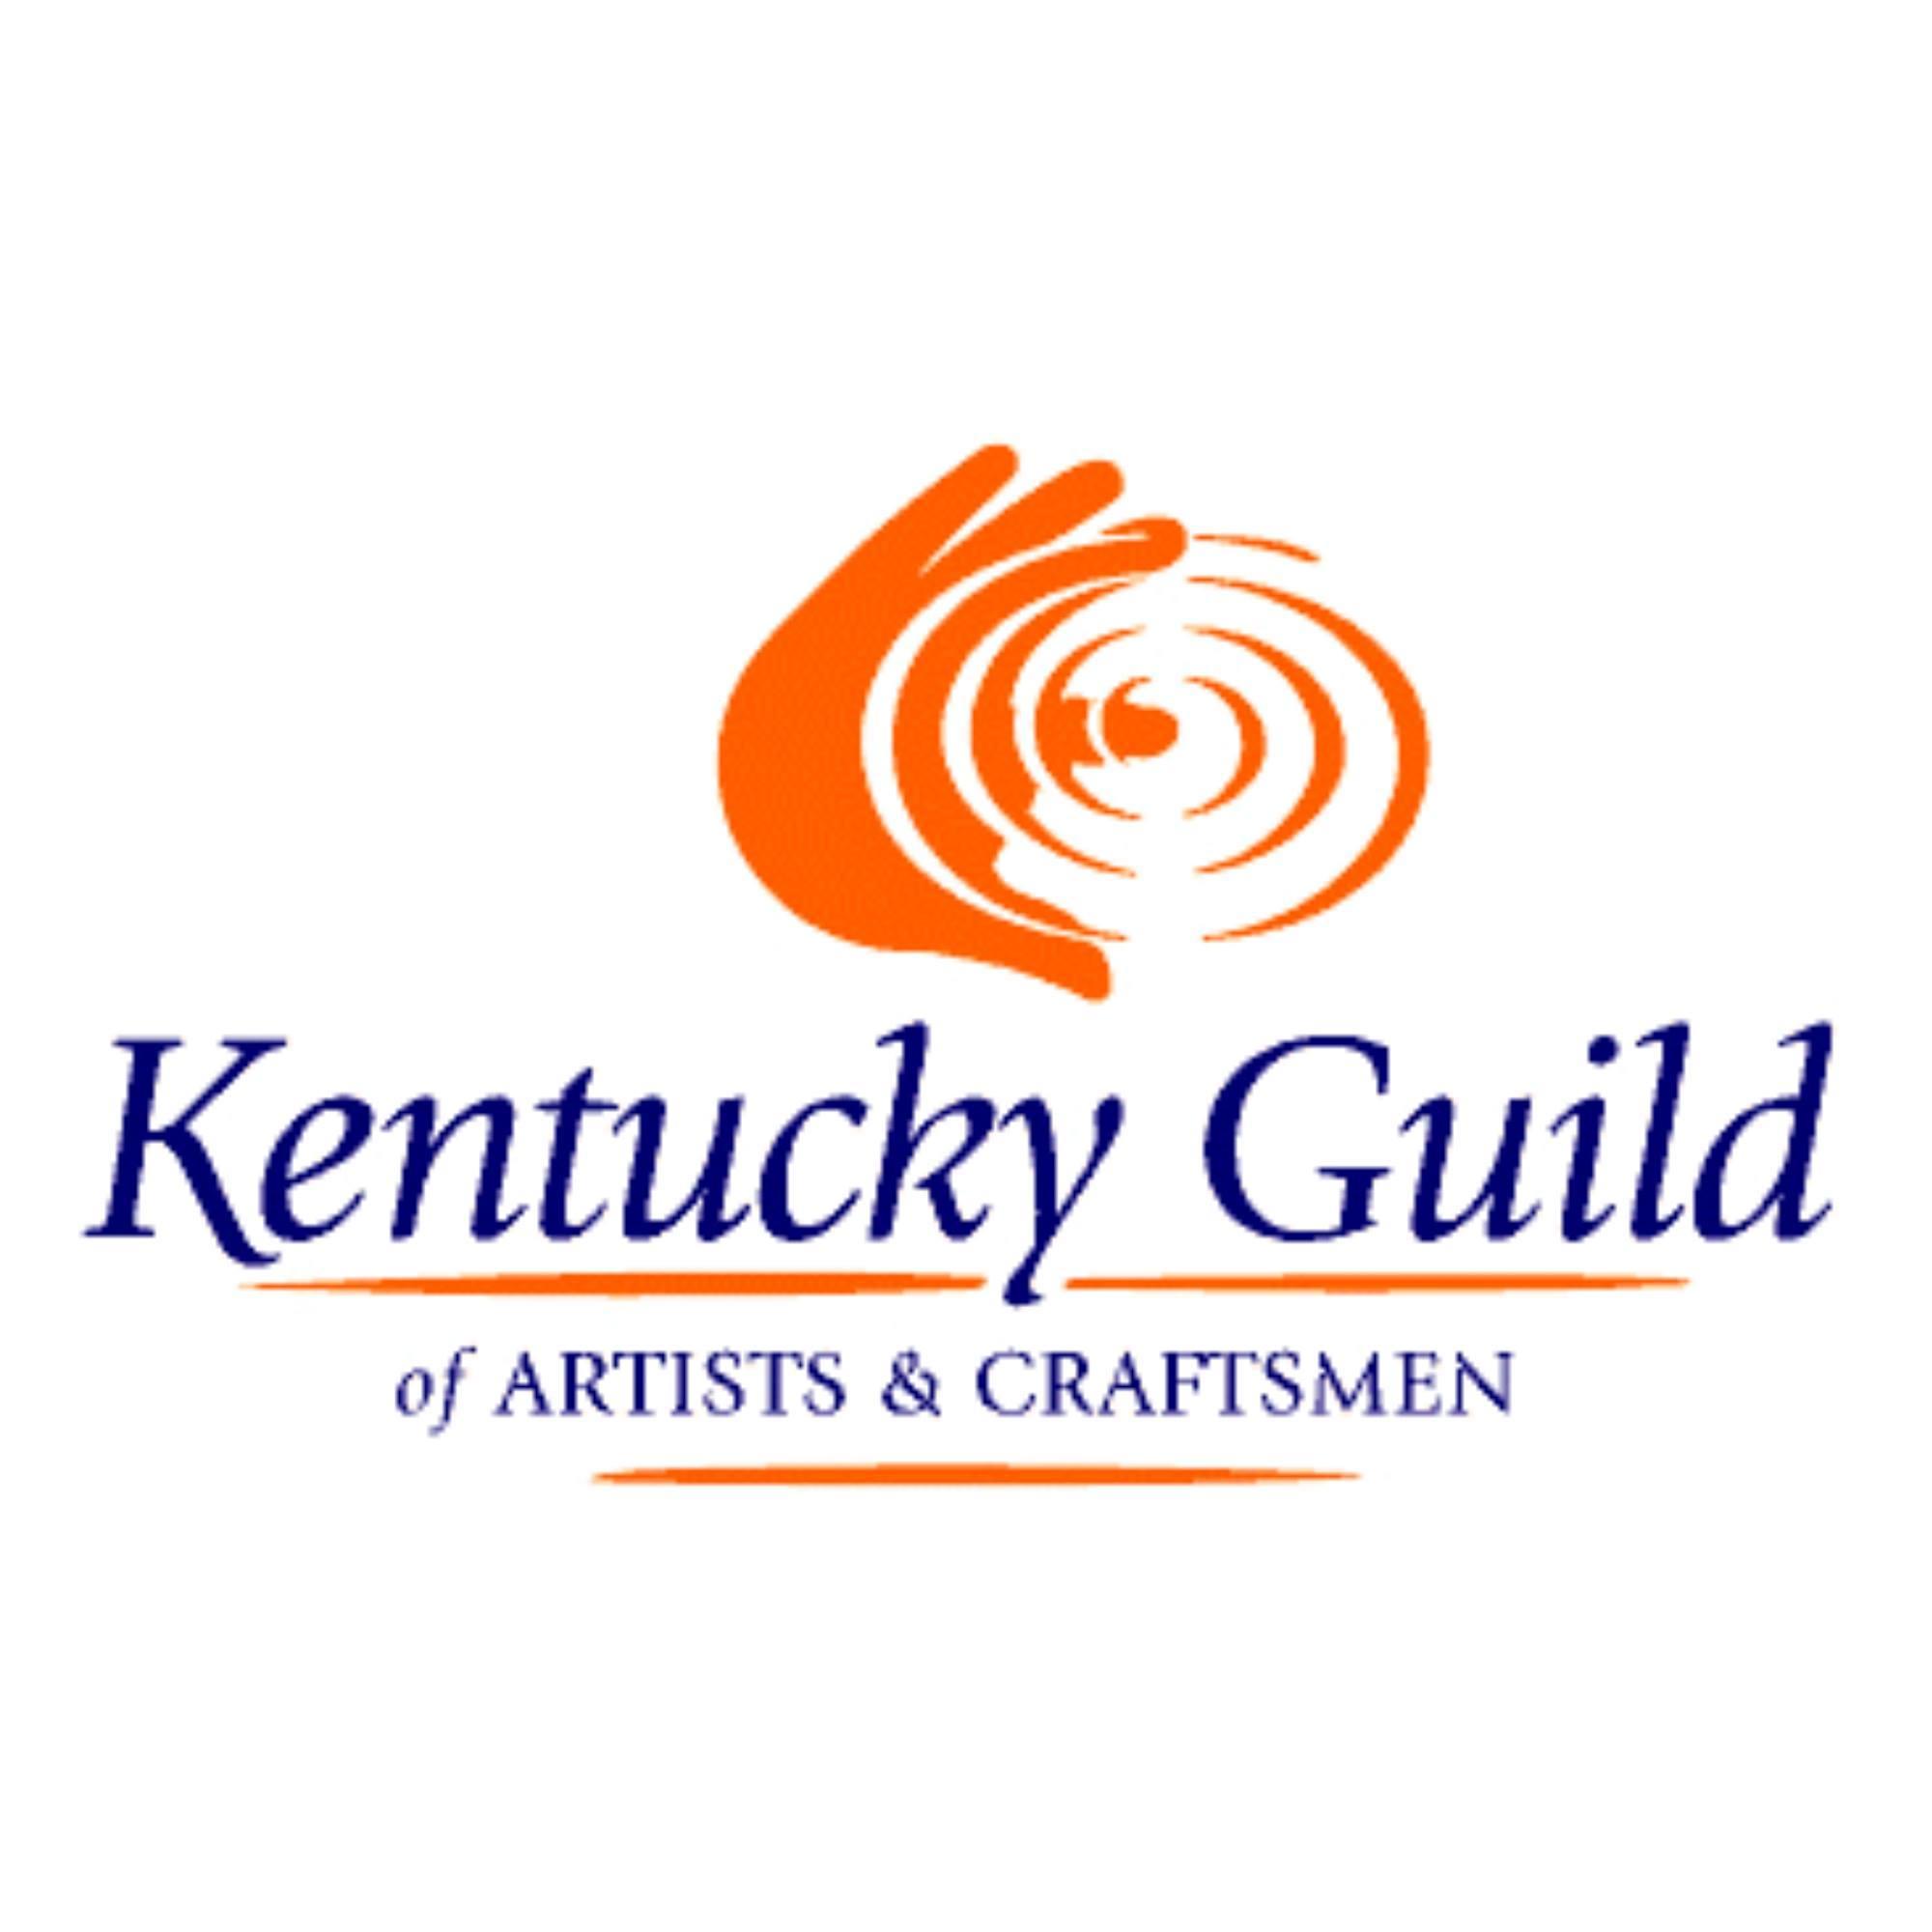 Kentucky Guild of Artists and Craftsmen